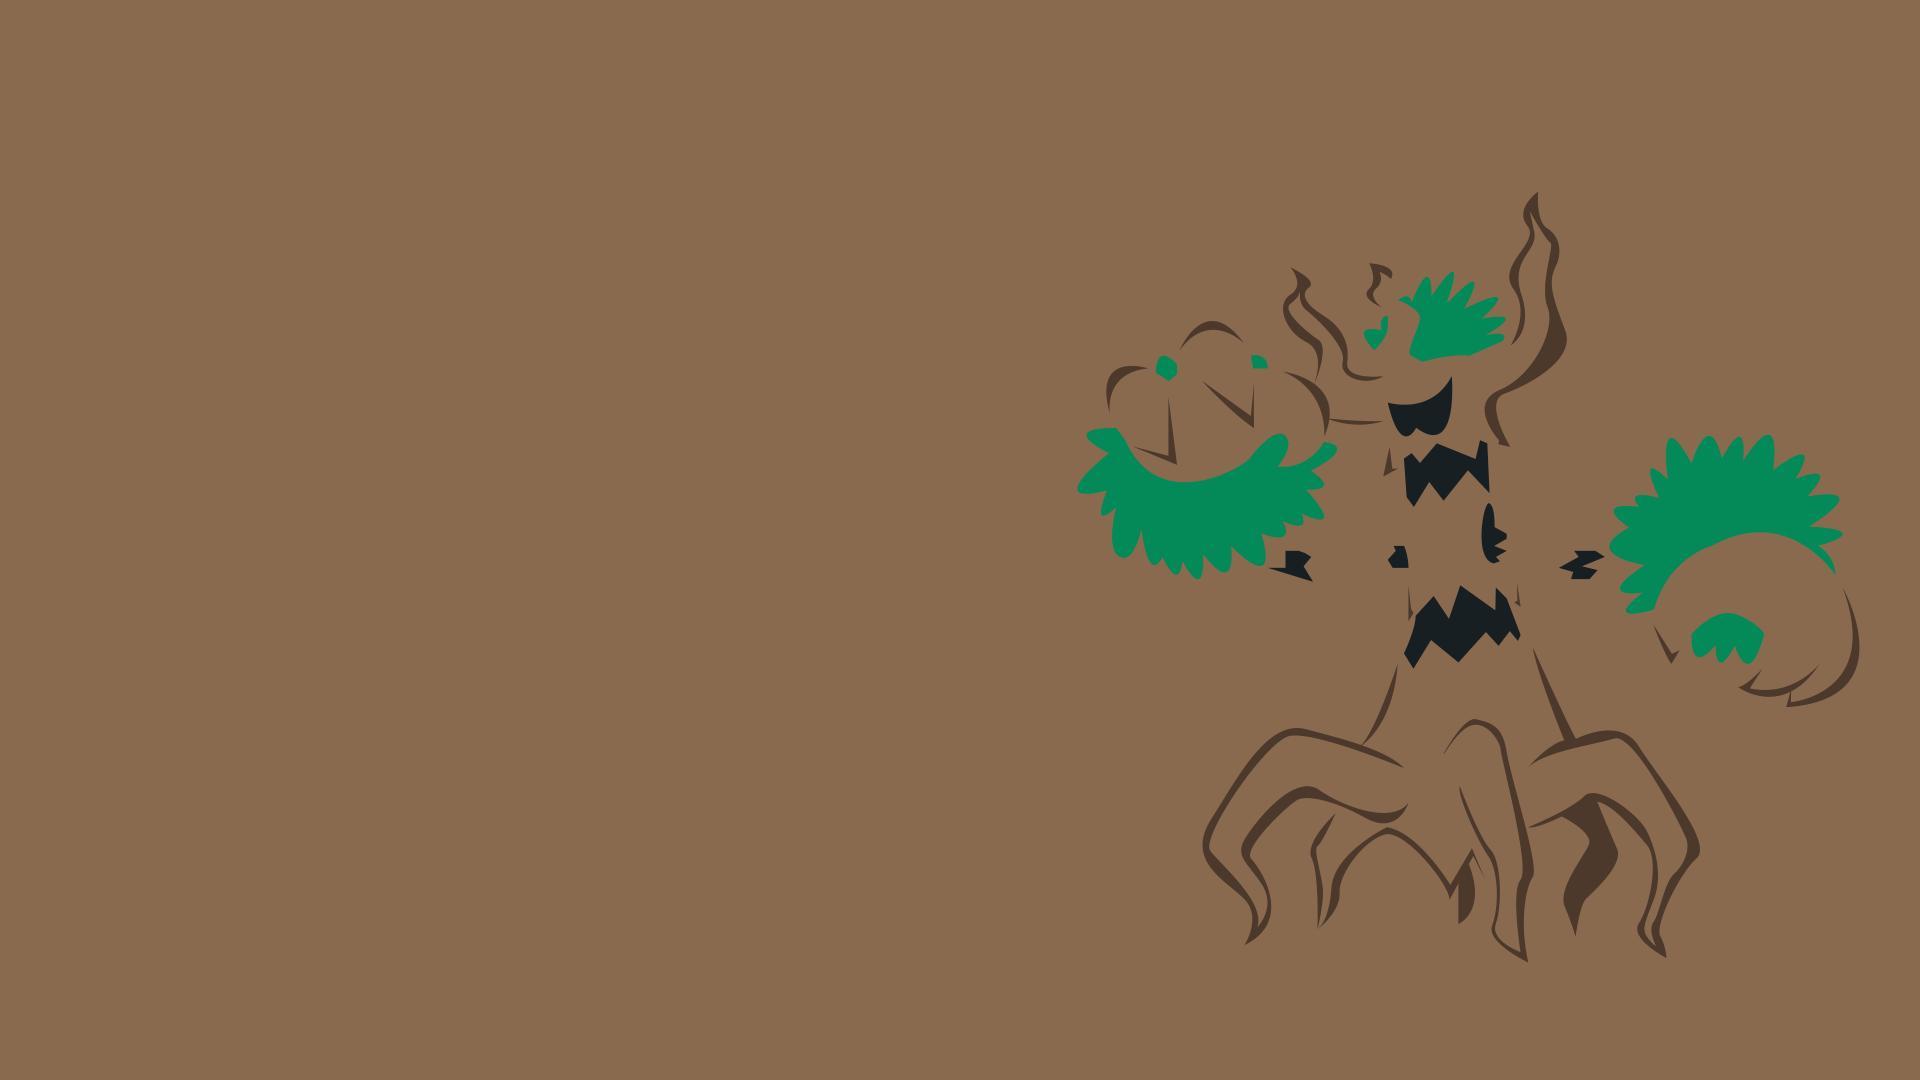 Trevenant Minimalism Brown Background wallpaper anime 1920x1080